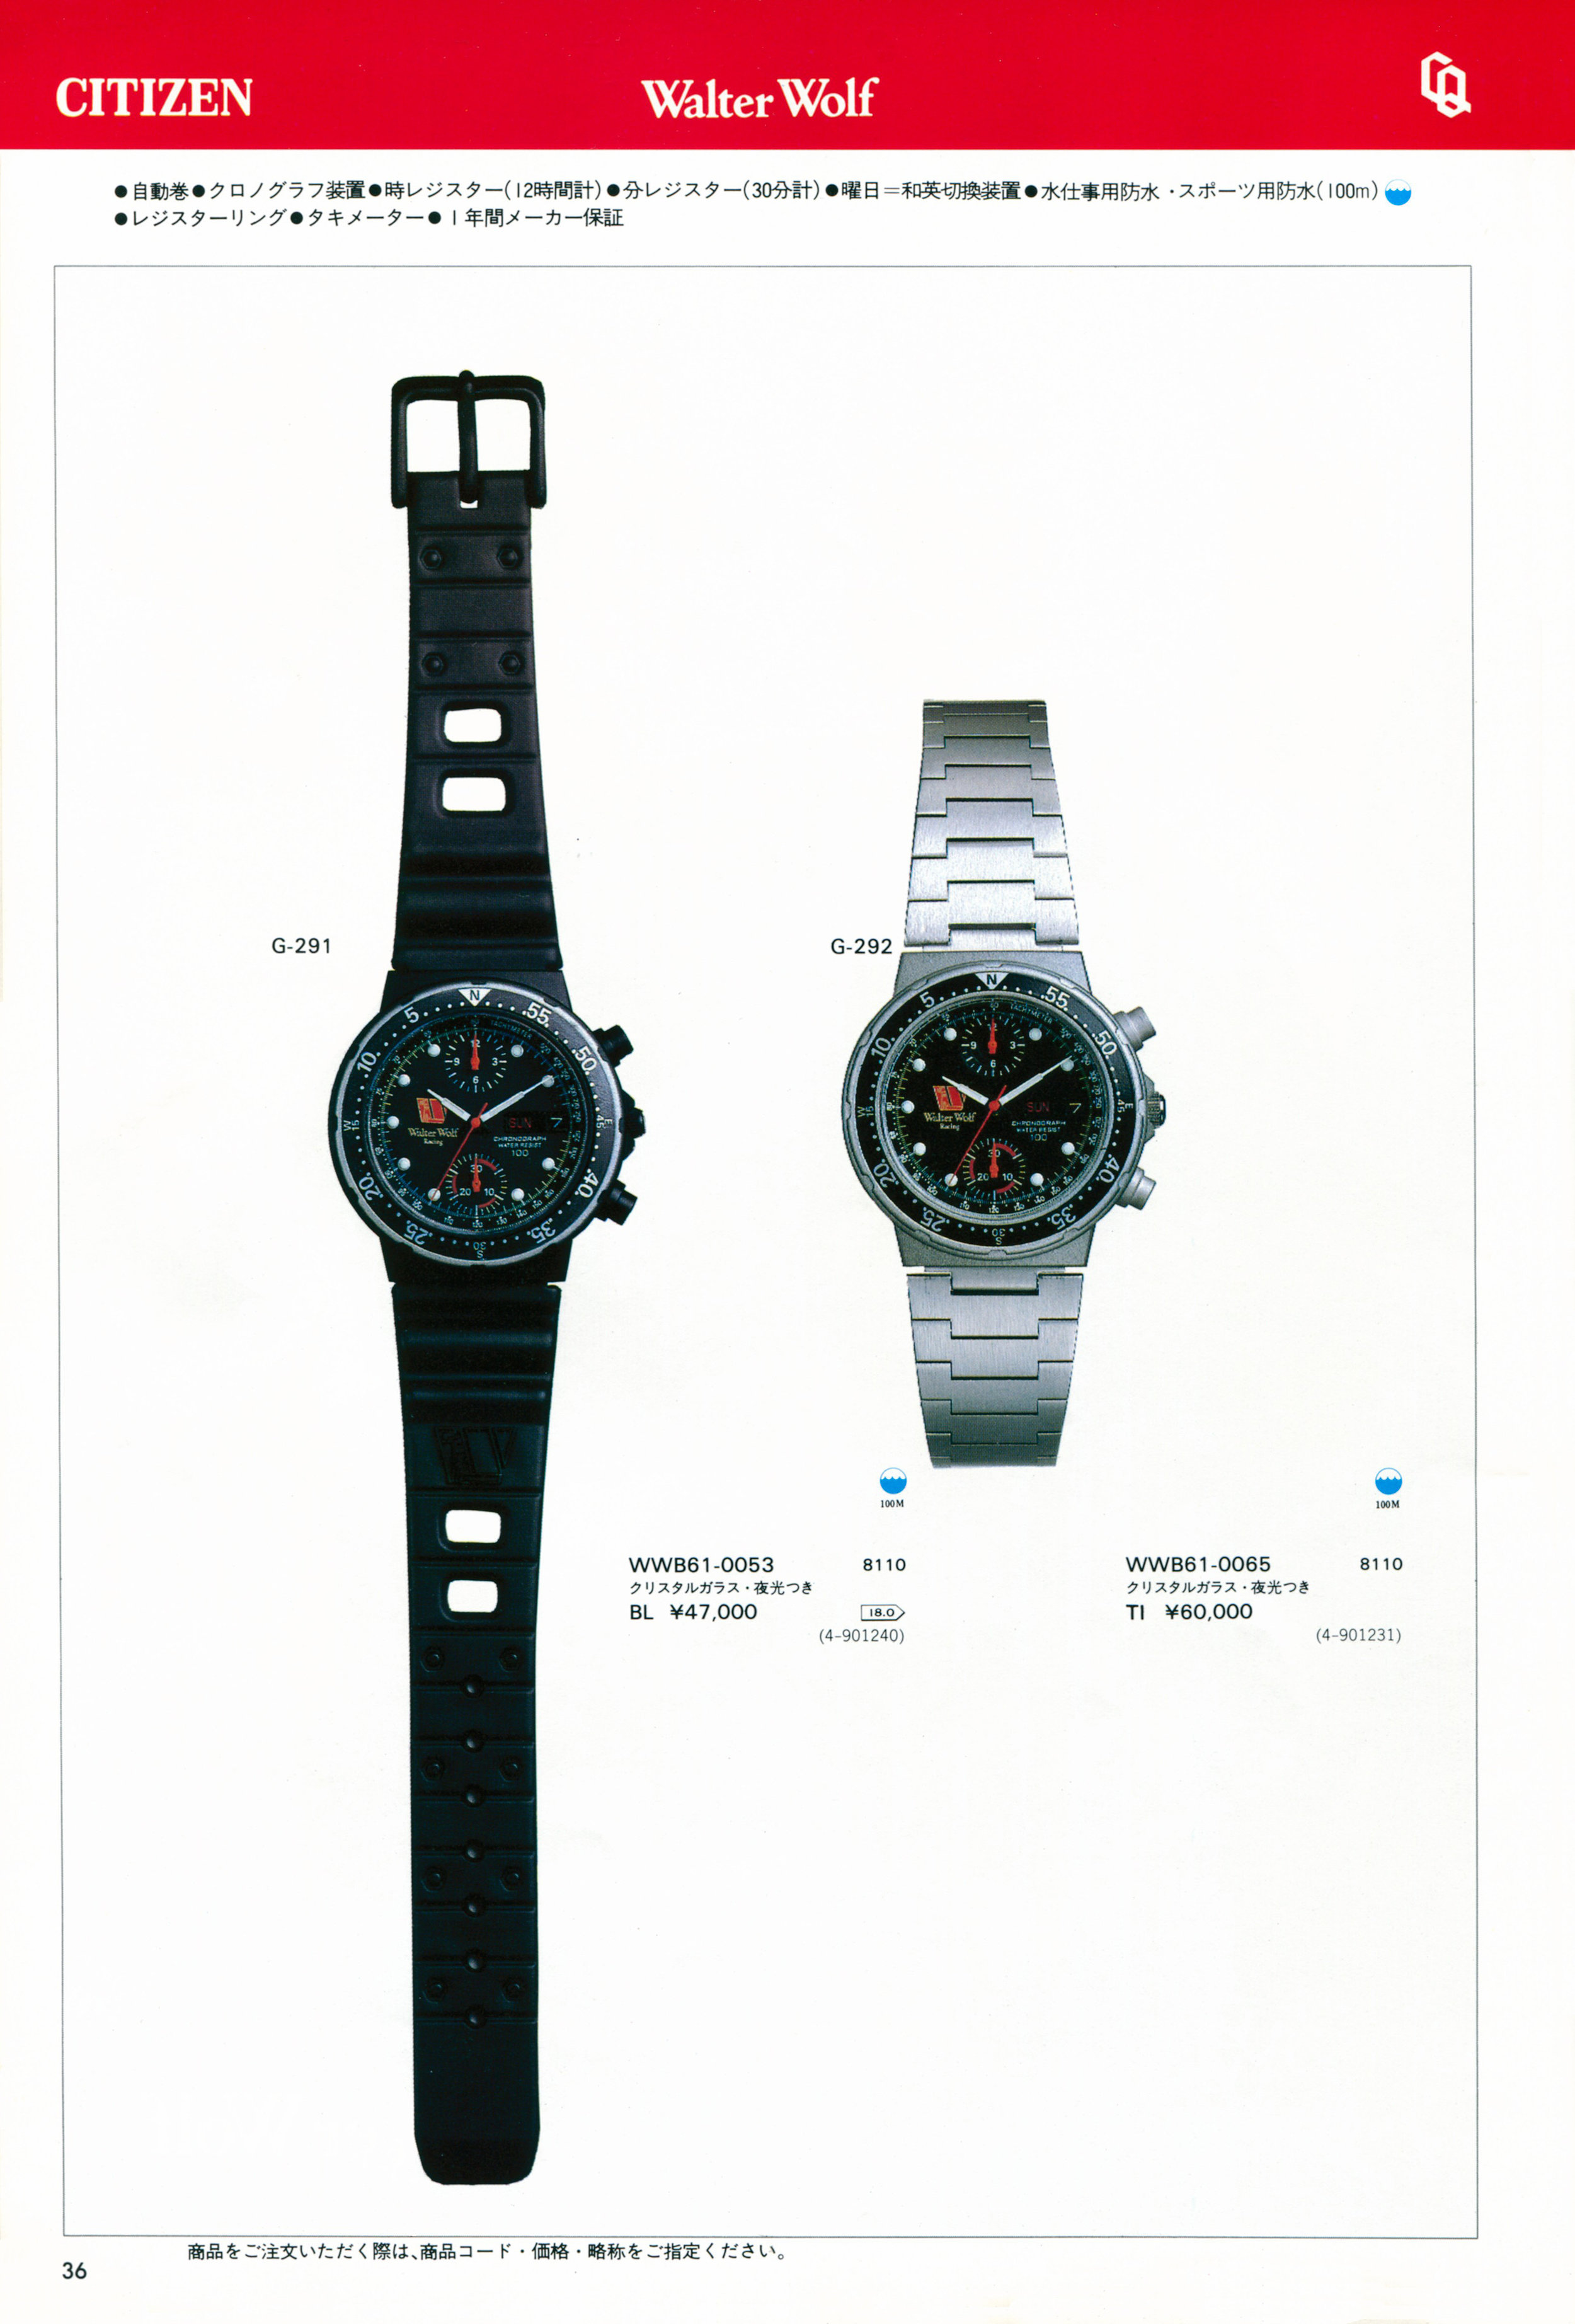 Citizen 1983-6 JDM Catalog